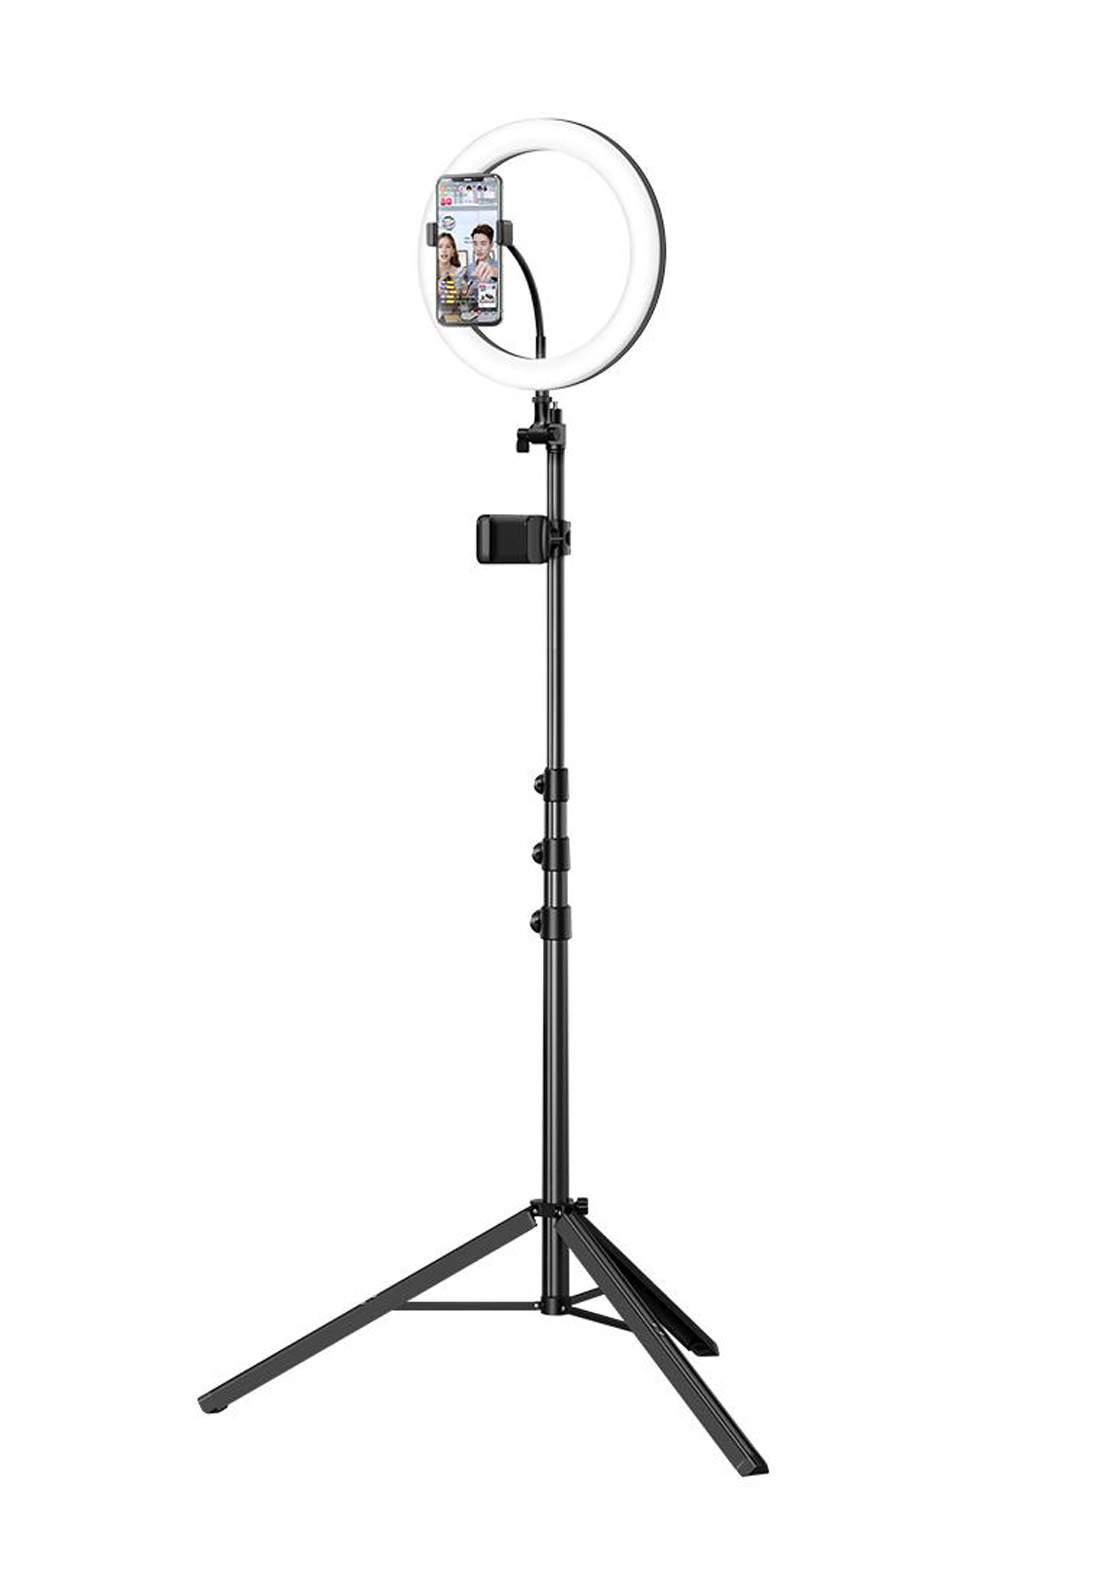 (2595)Mcdodo TB07970 Mobile Phone Selfie Ring Light with Tripod Stand مصباح حلقي للتصوير  مع حامل